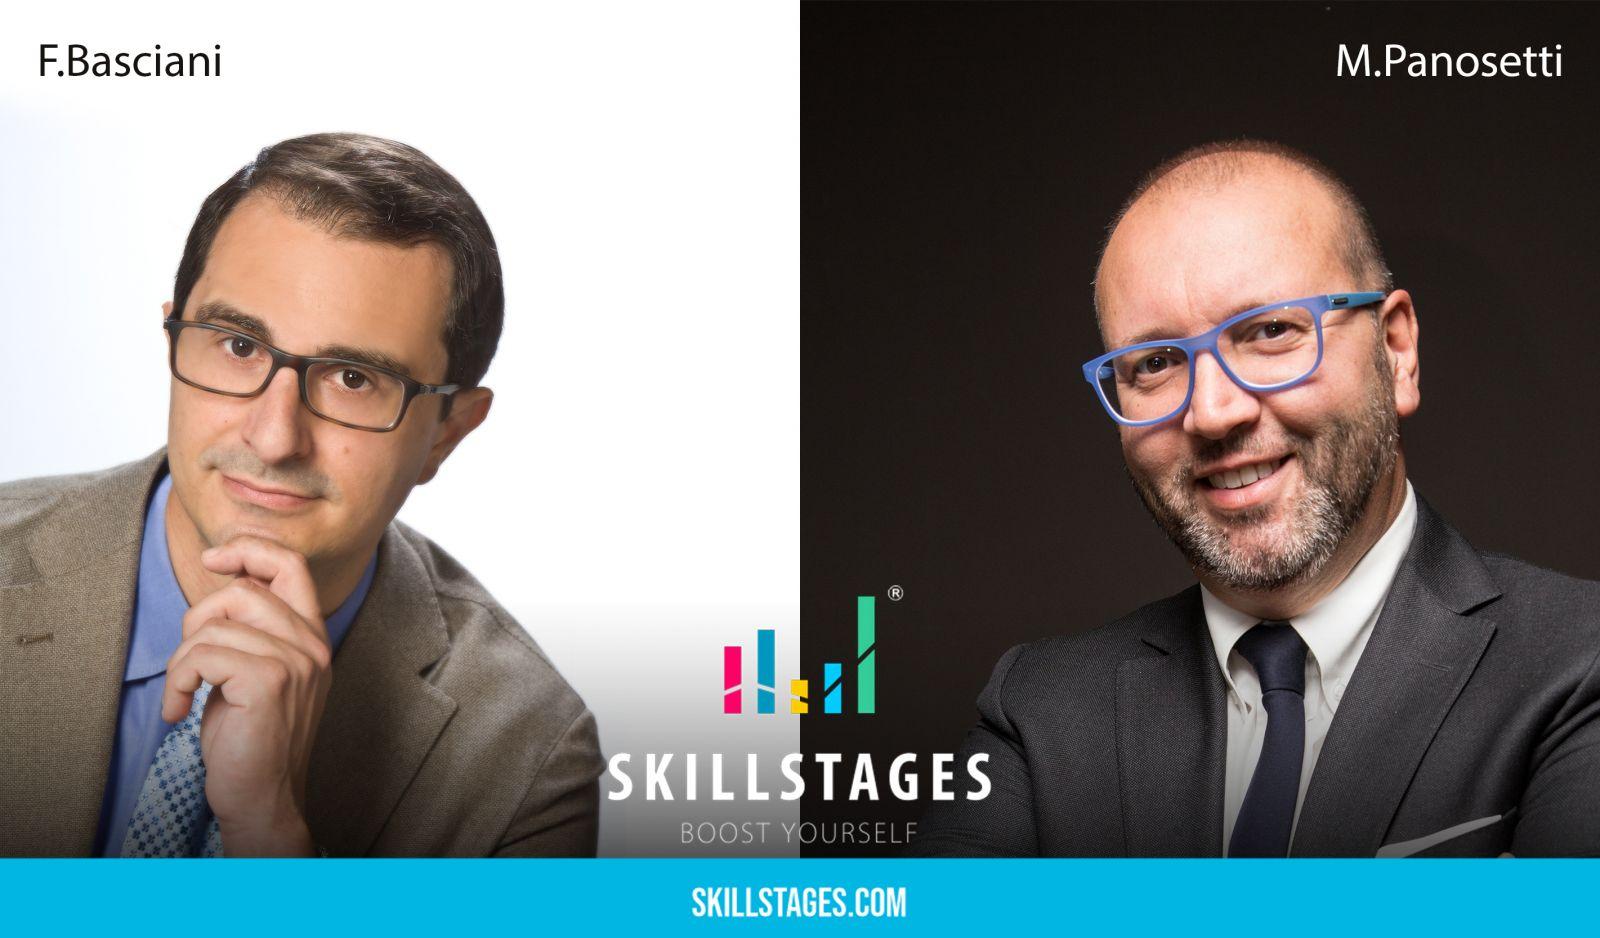 wwww.skillstages.com